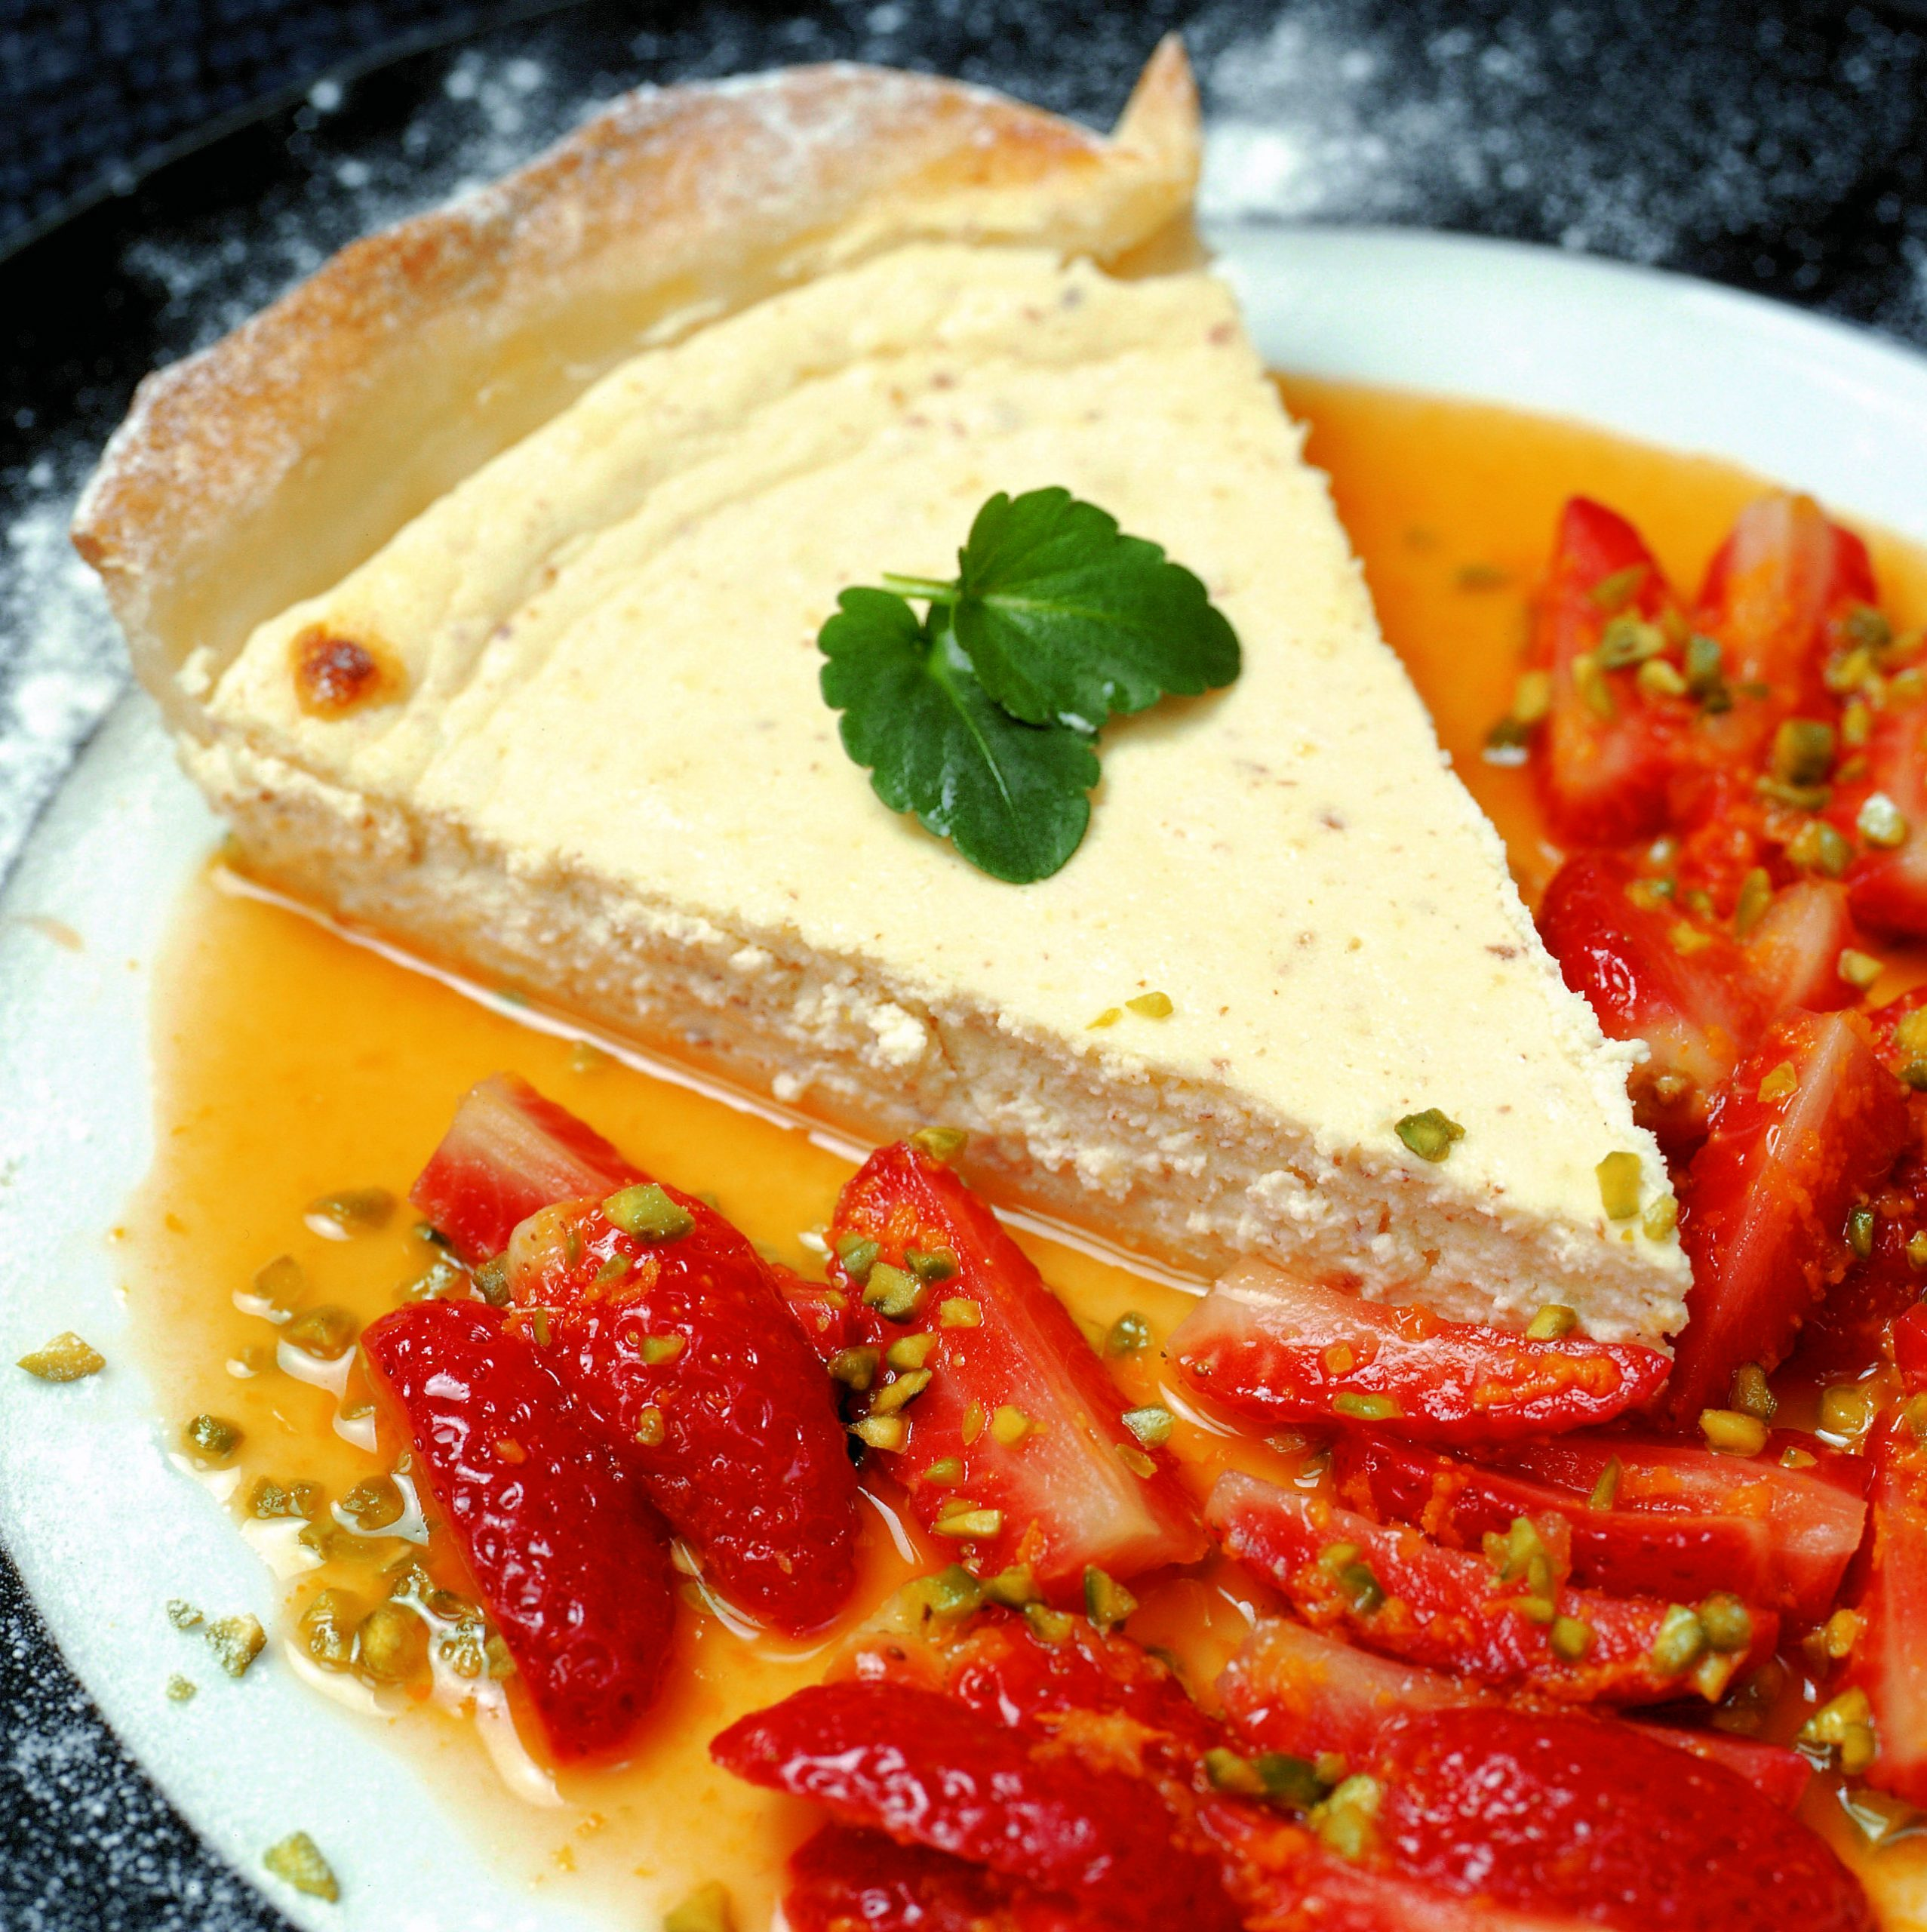 Lauwarme Quarkwähe mit Erdbeeren